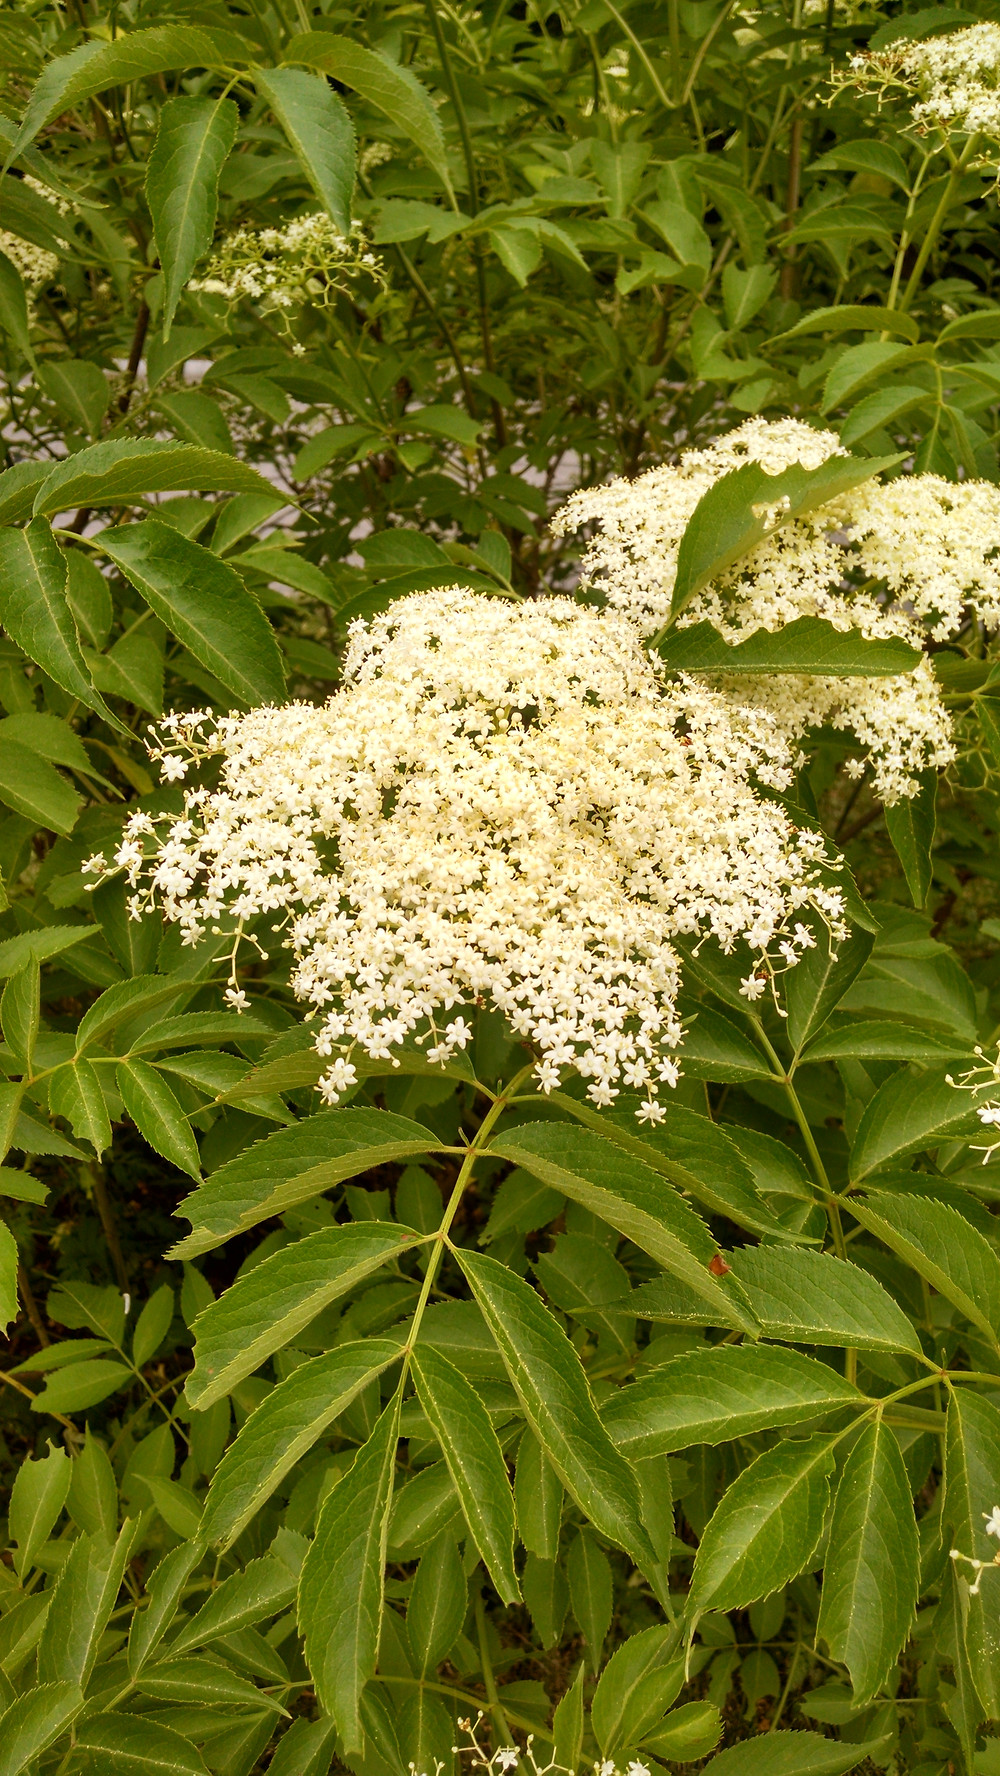 elder bush in full bloom with creamy white flowers